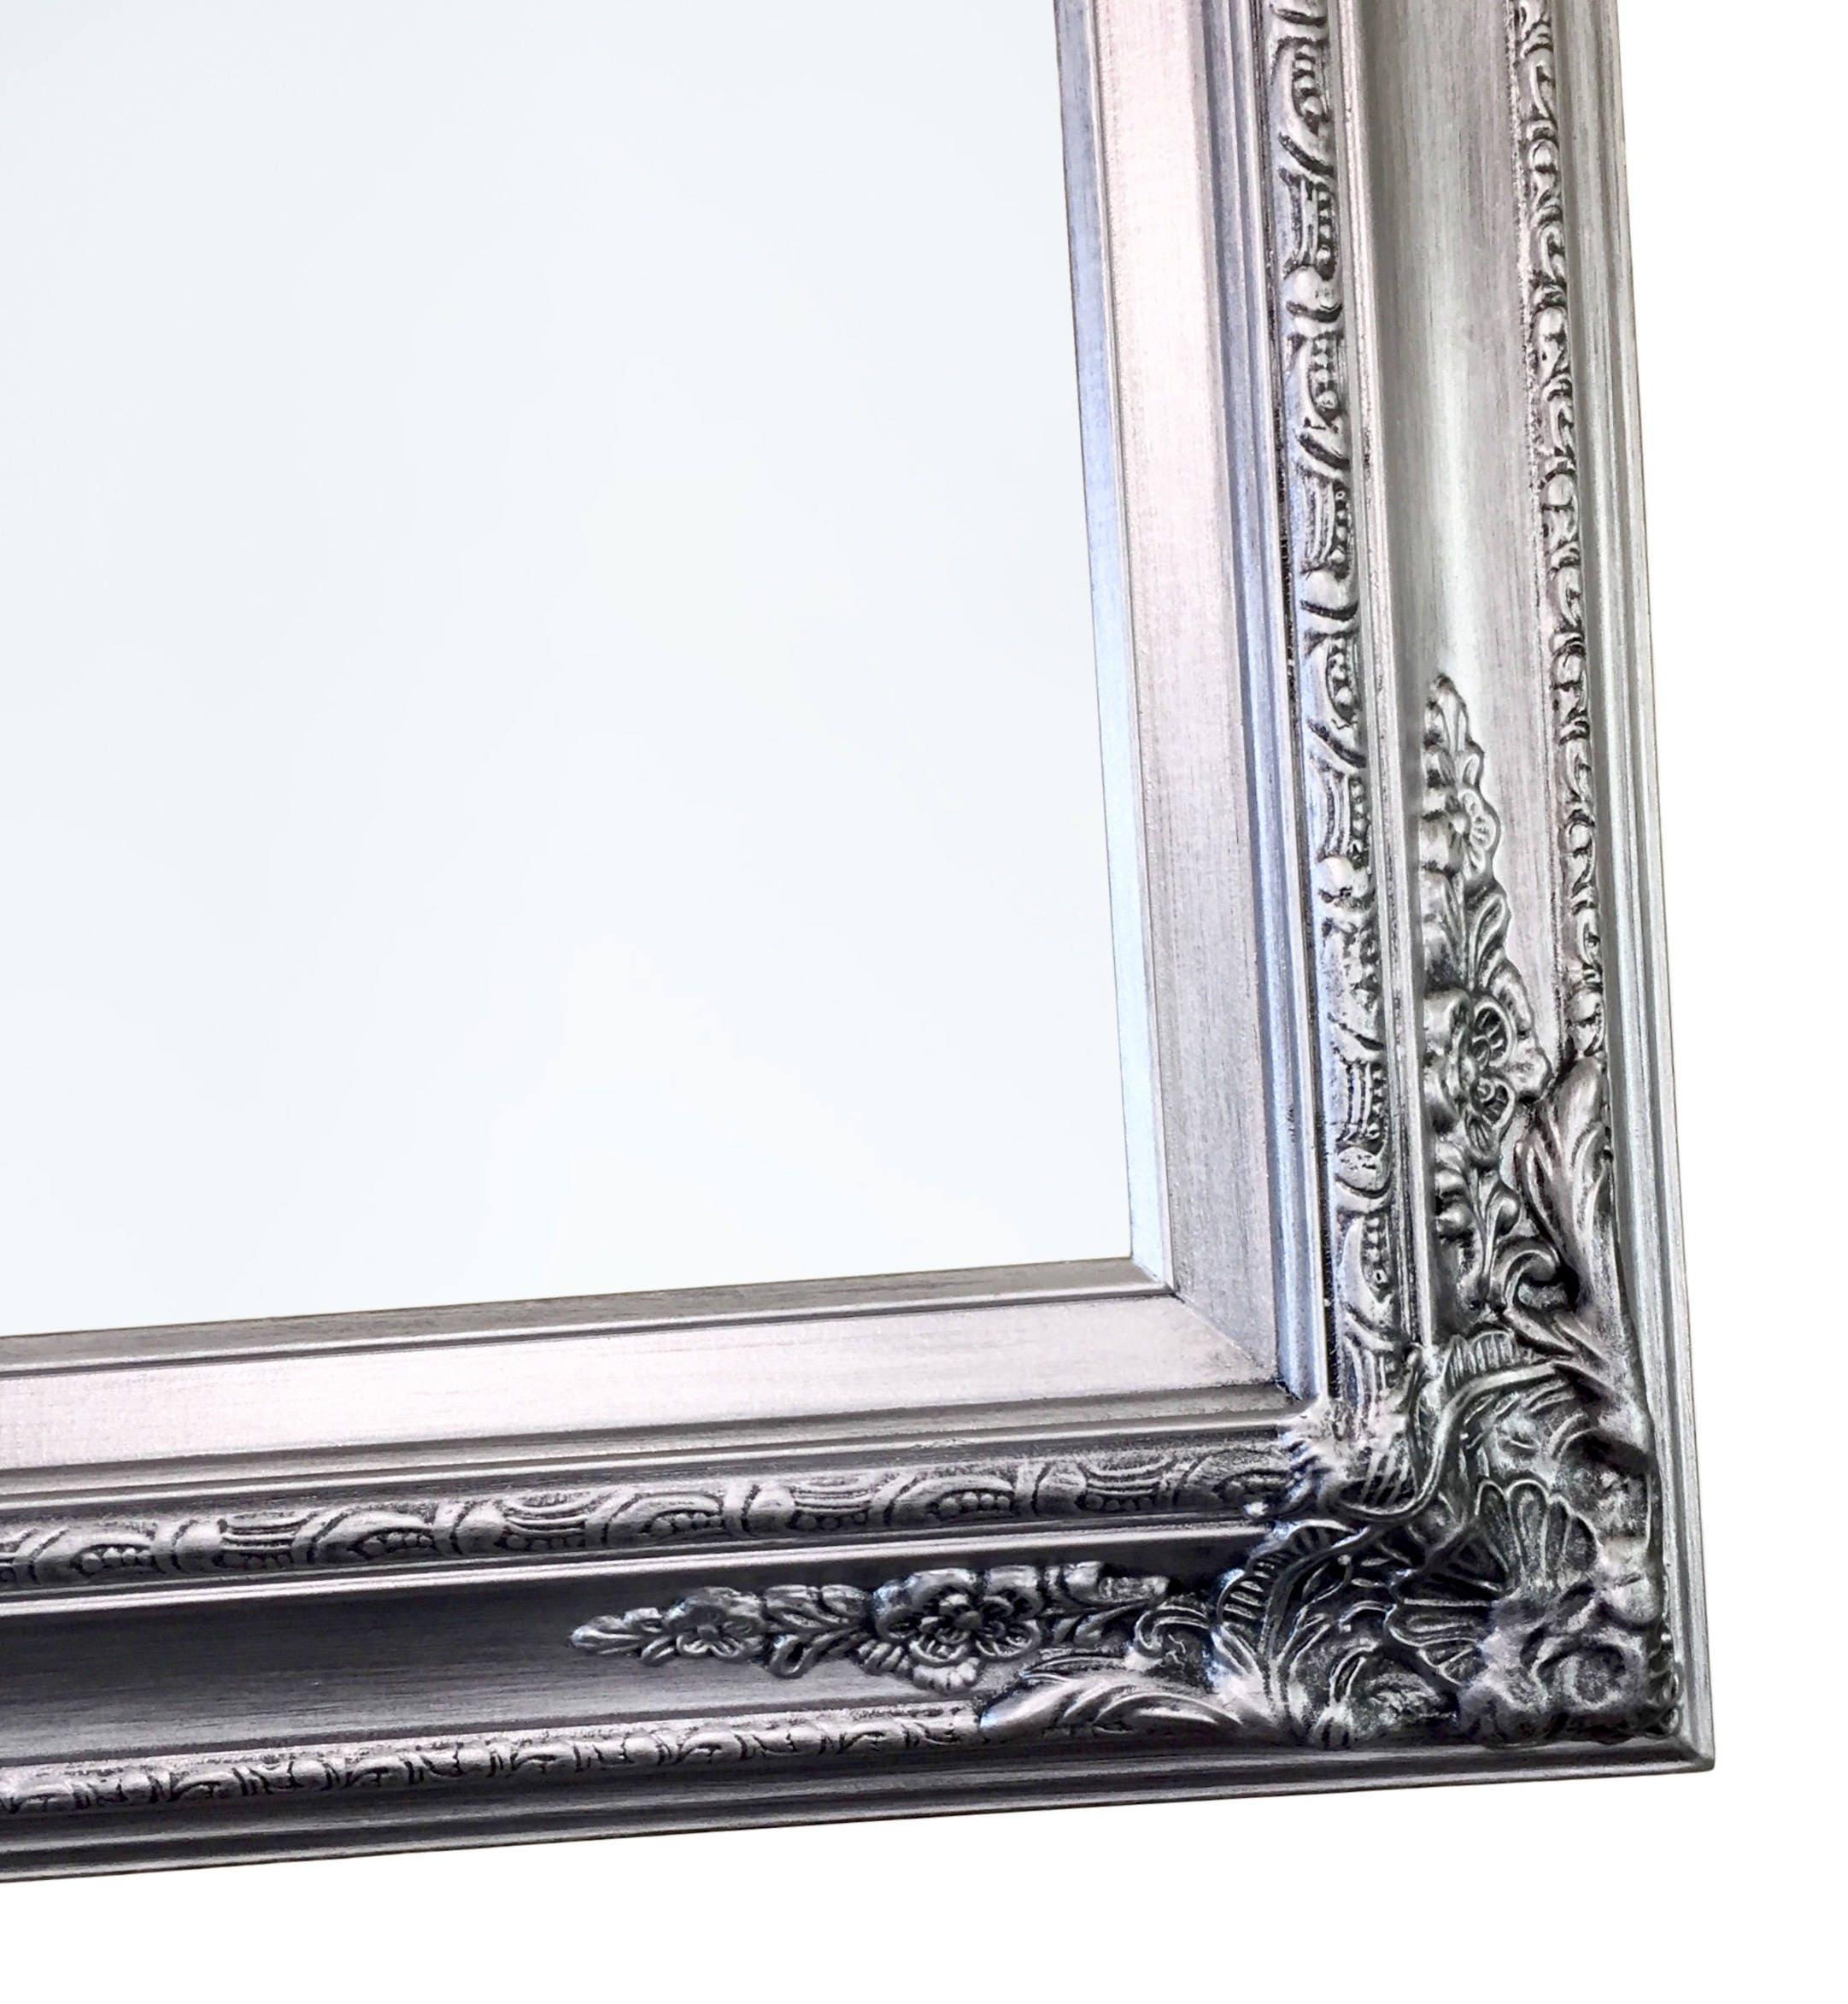 BATHROOM VANITY MIRRORS For Sale 44x32 Silver   Etsy